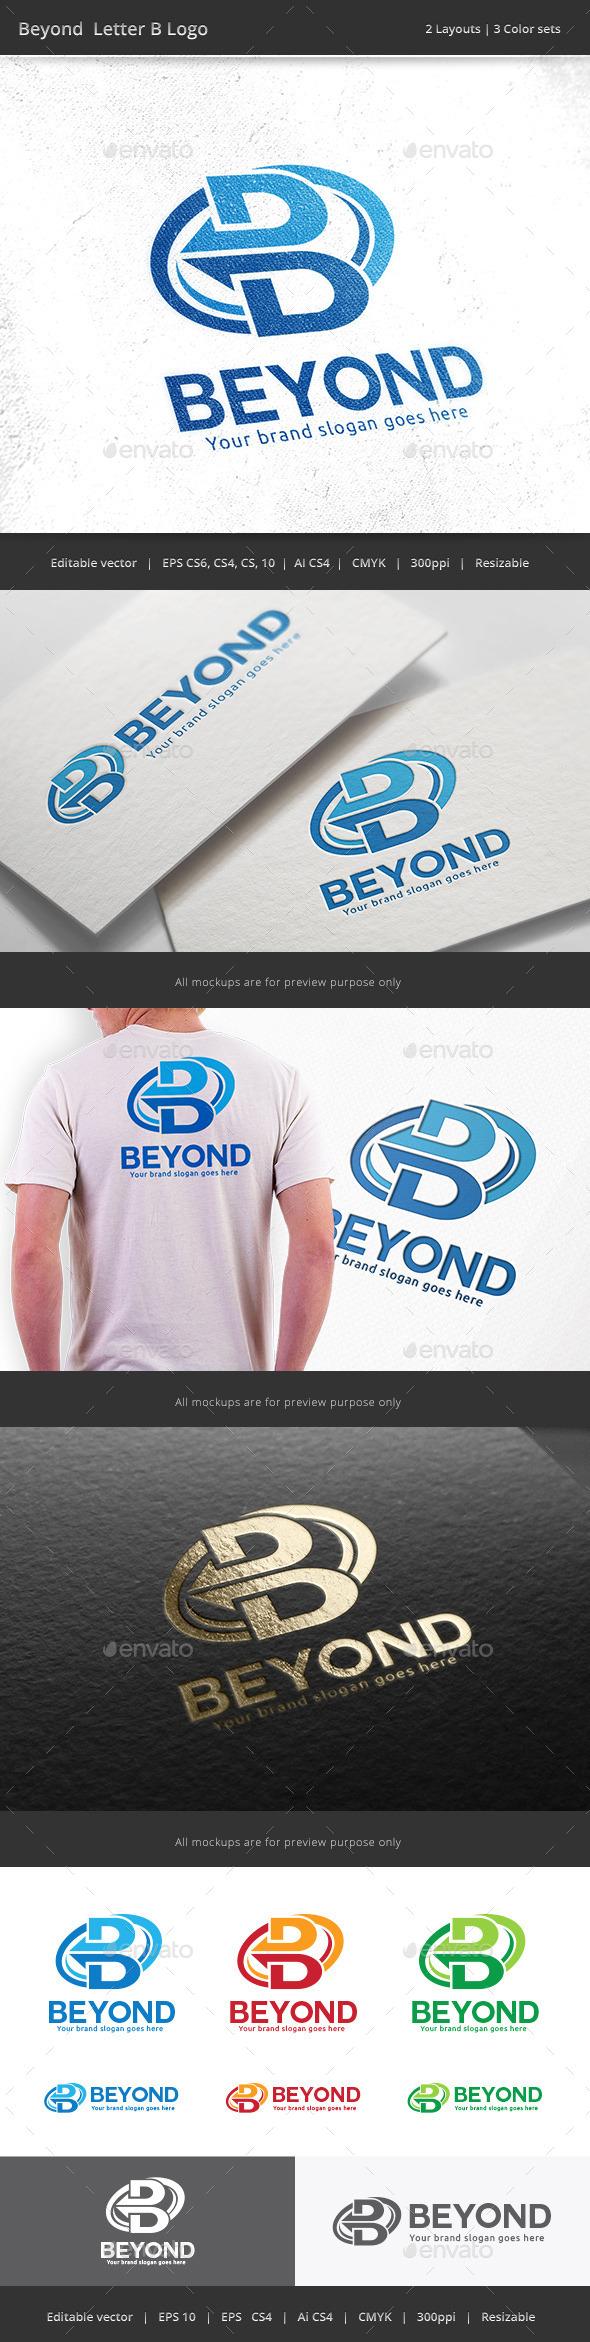 Beyond Letter B Logo - Letters Logo Templates